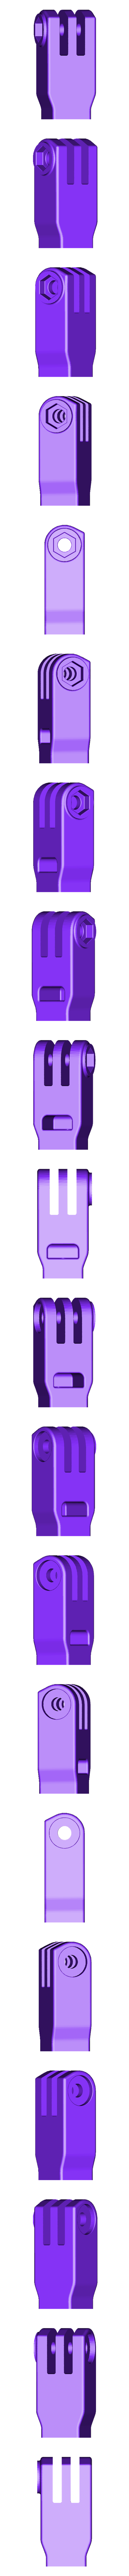 Mount_v2.STL Télécharger fichier STL gratuit Support GoPro pour bodyboard v2 • Plan pour impression 3D, Cerragh